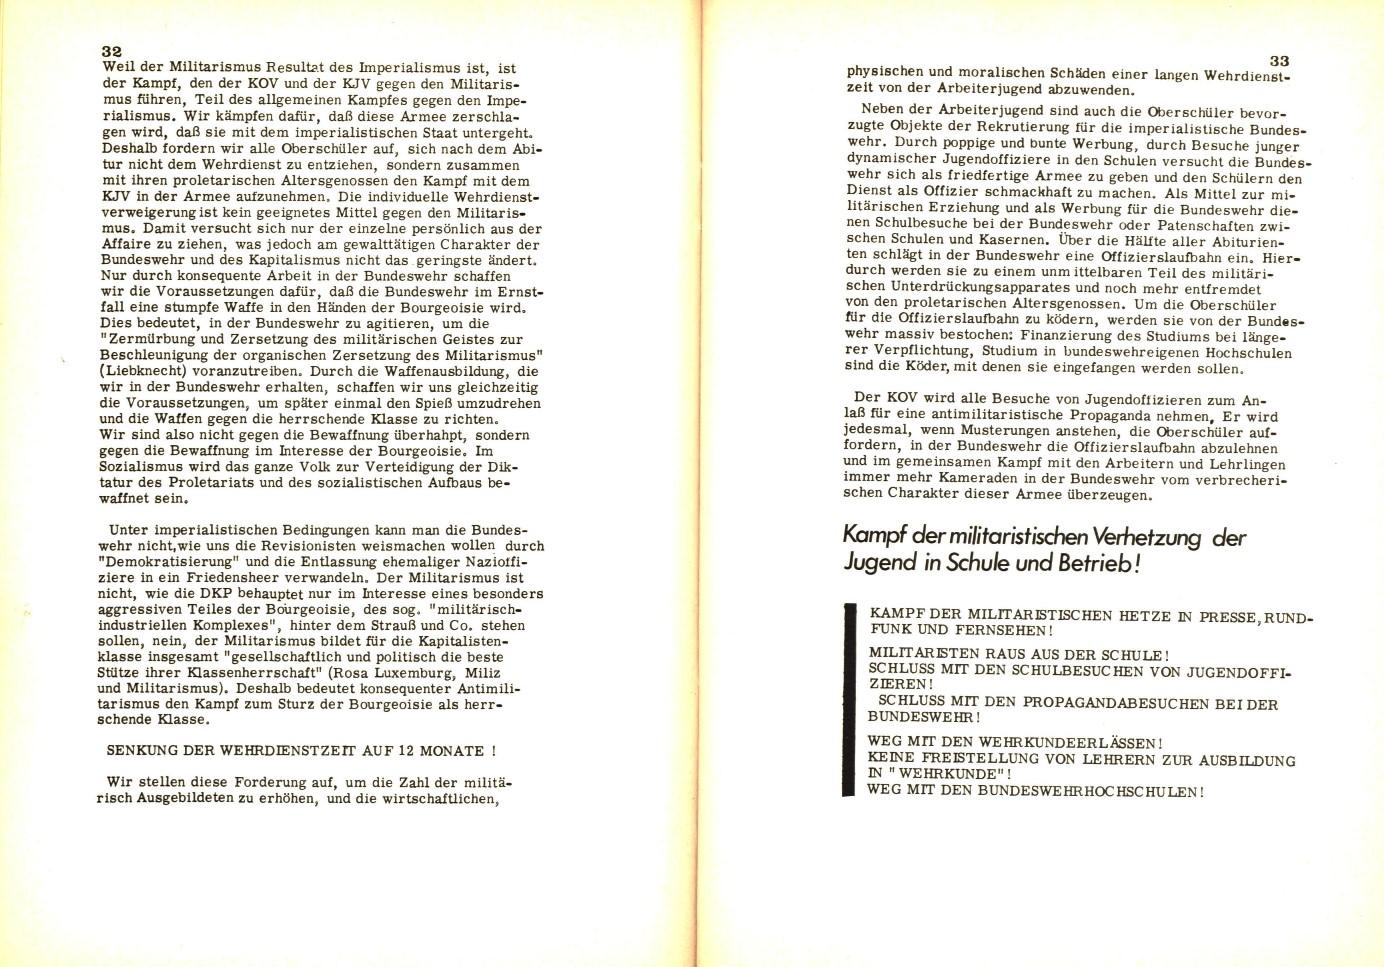 KOV_1973_Aktionsprogramm_19